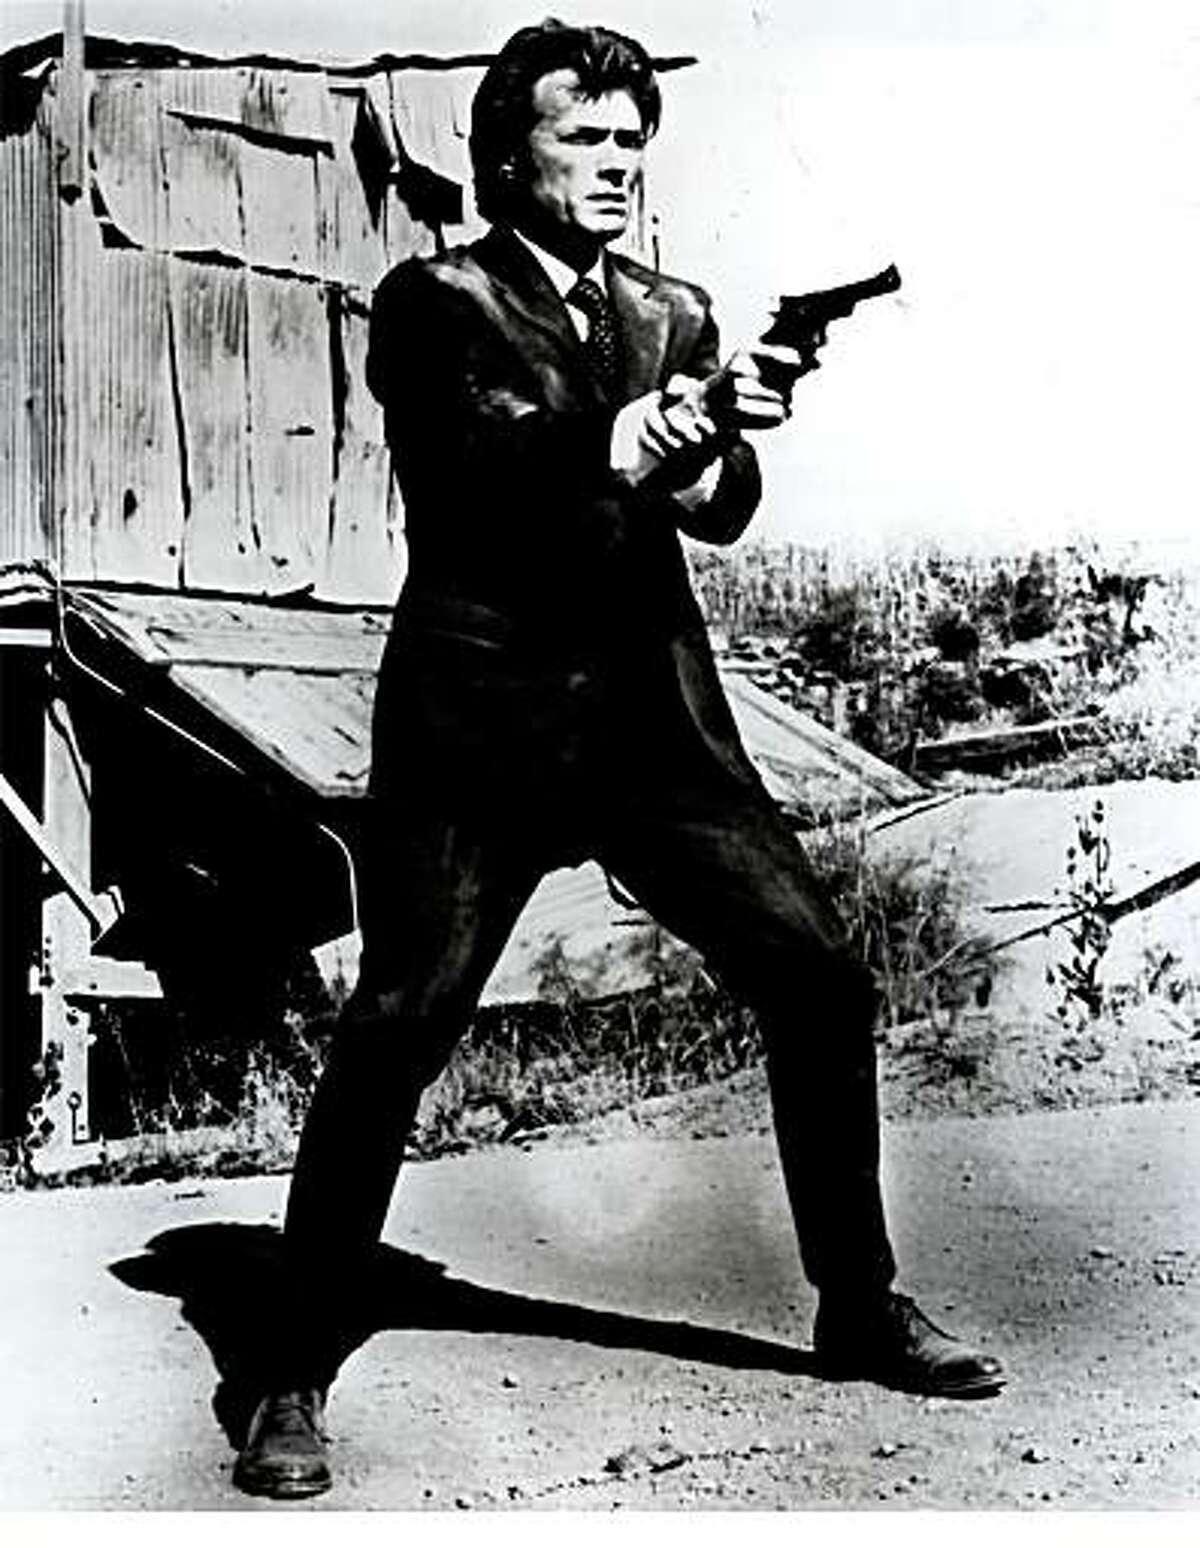 Clint Eastwook as Dirty Harry Callahan